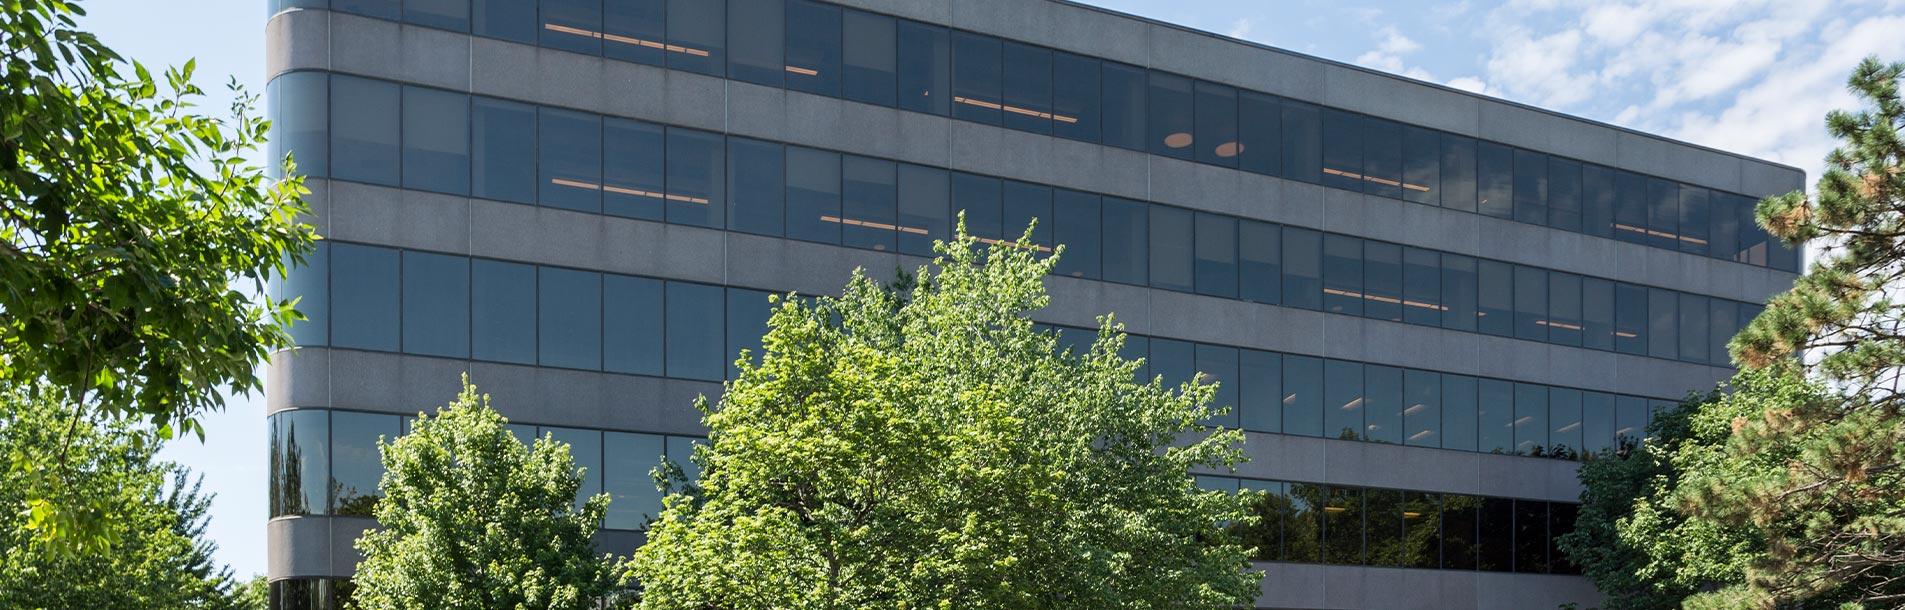 Kbp Bells Join Home Office